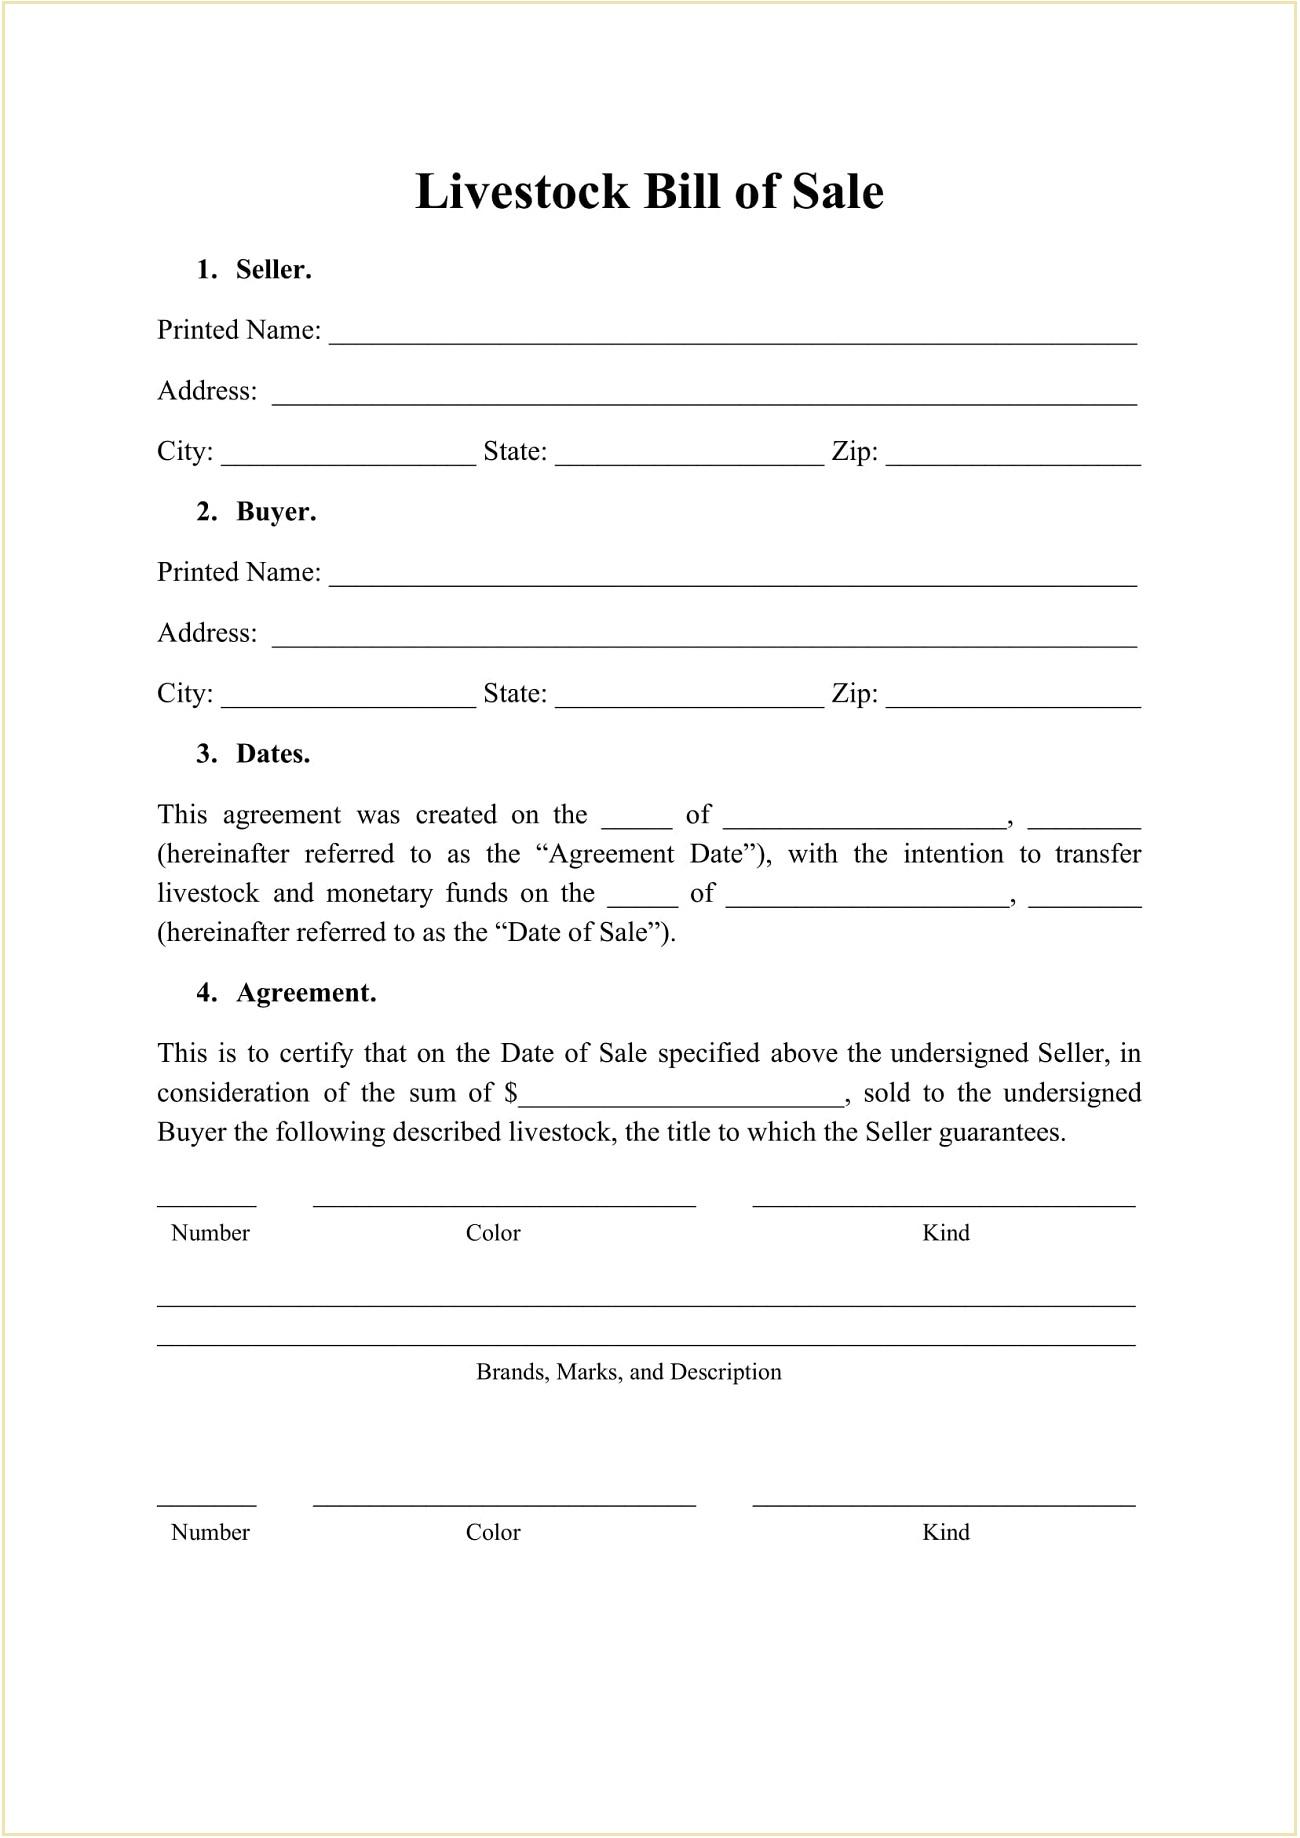 Animal Farm Bill of Sale PDF